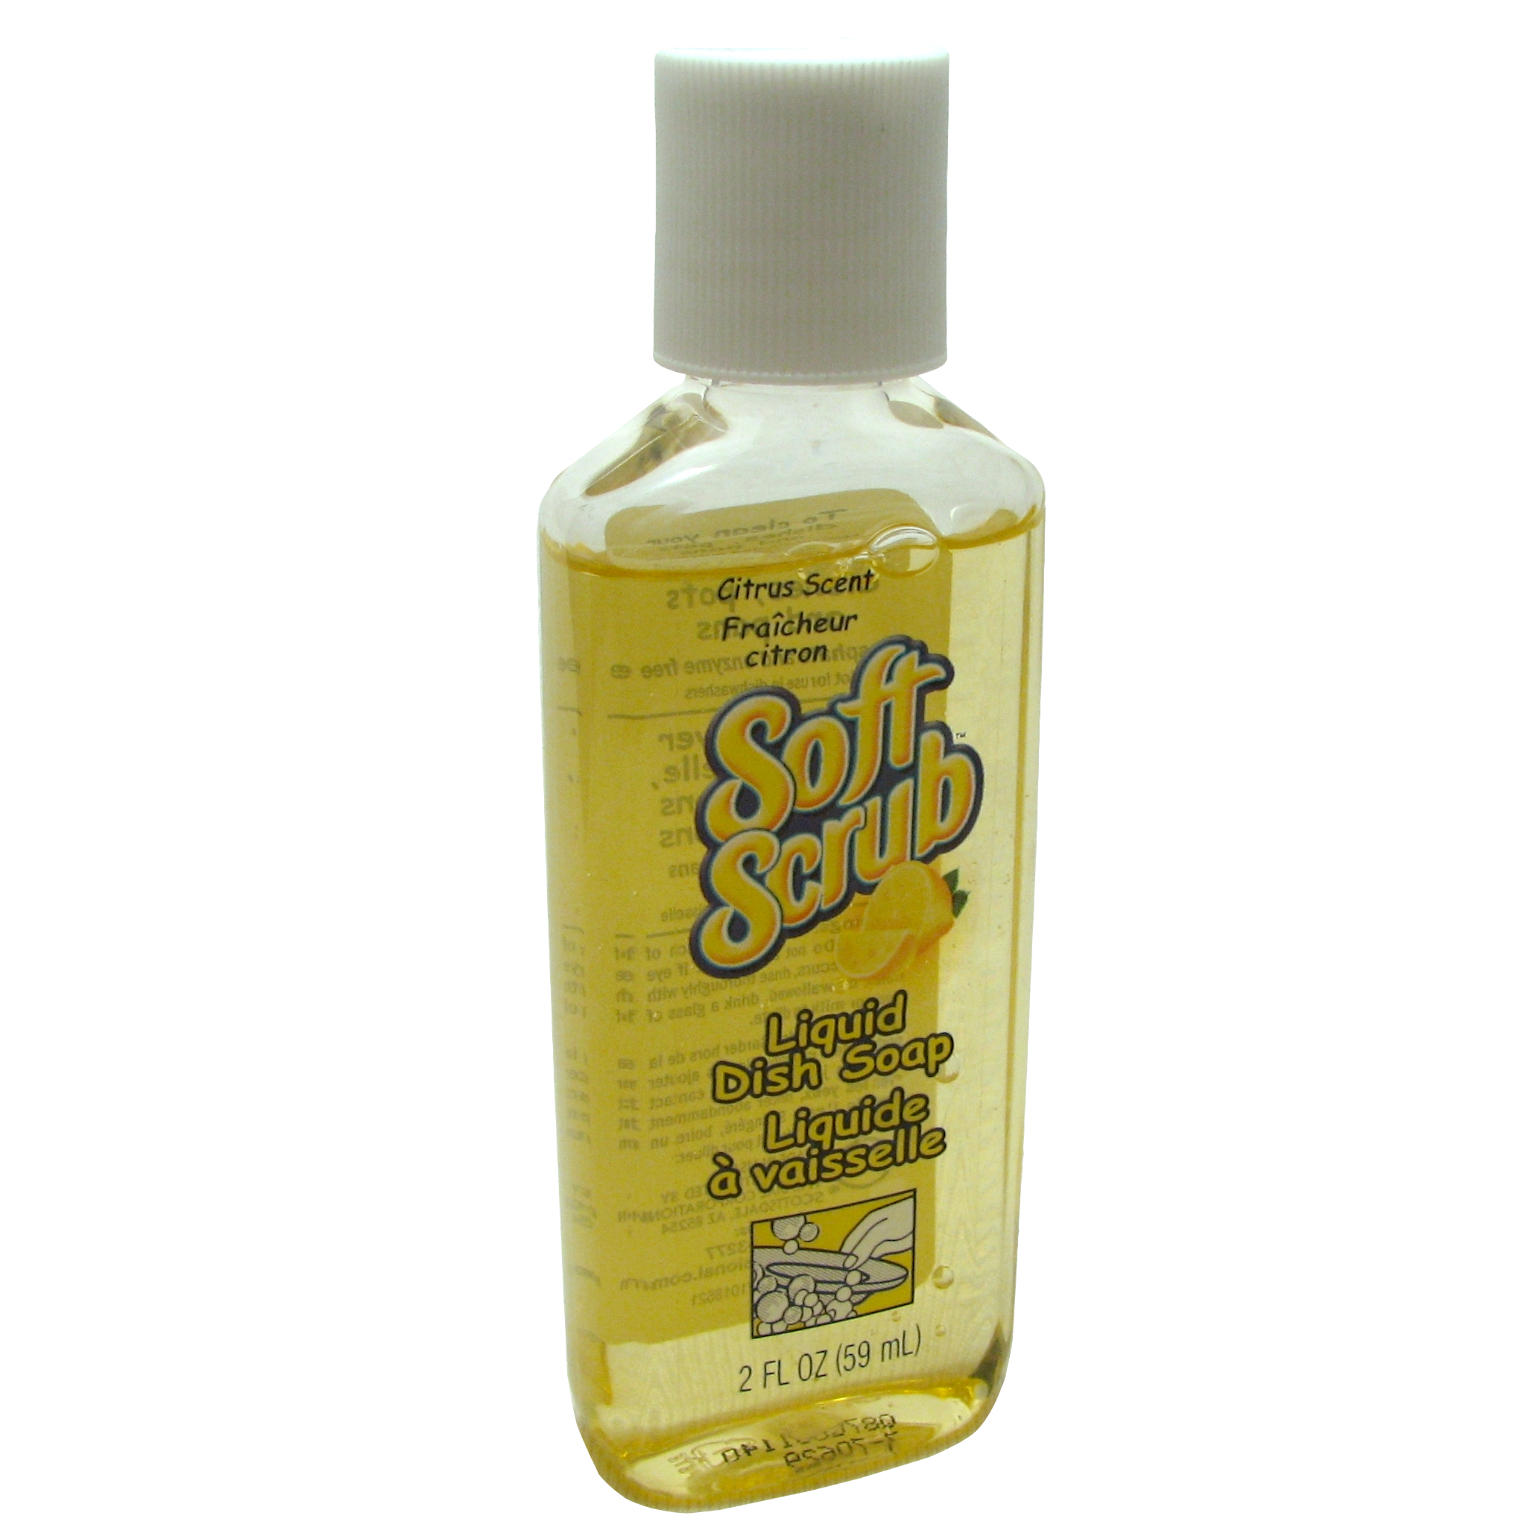 Soft SCRUB Liquid Dish Soap - Citrus Scent (665565)